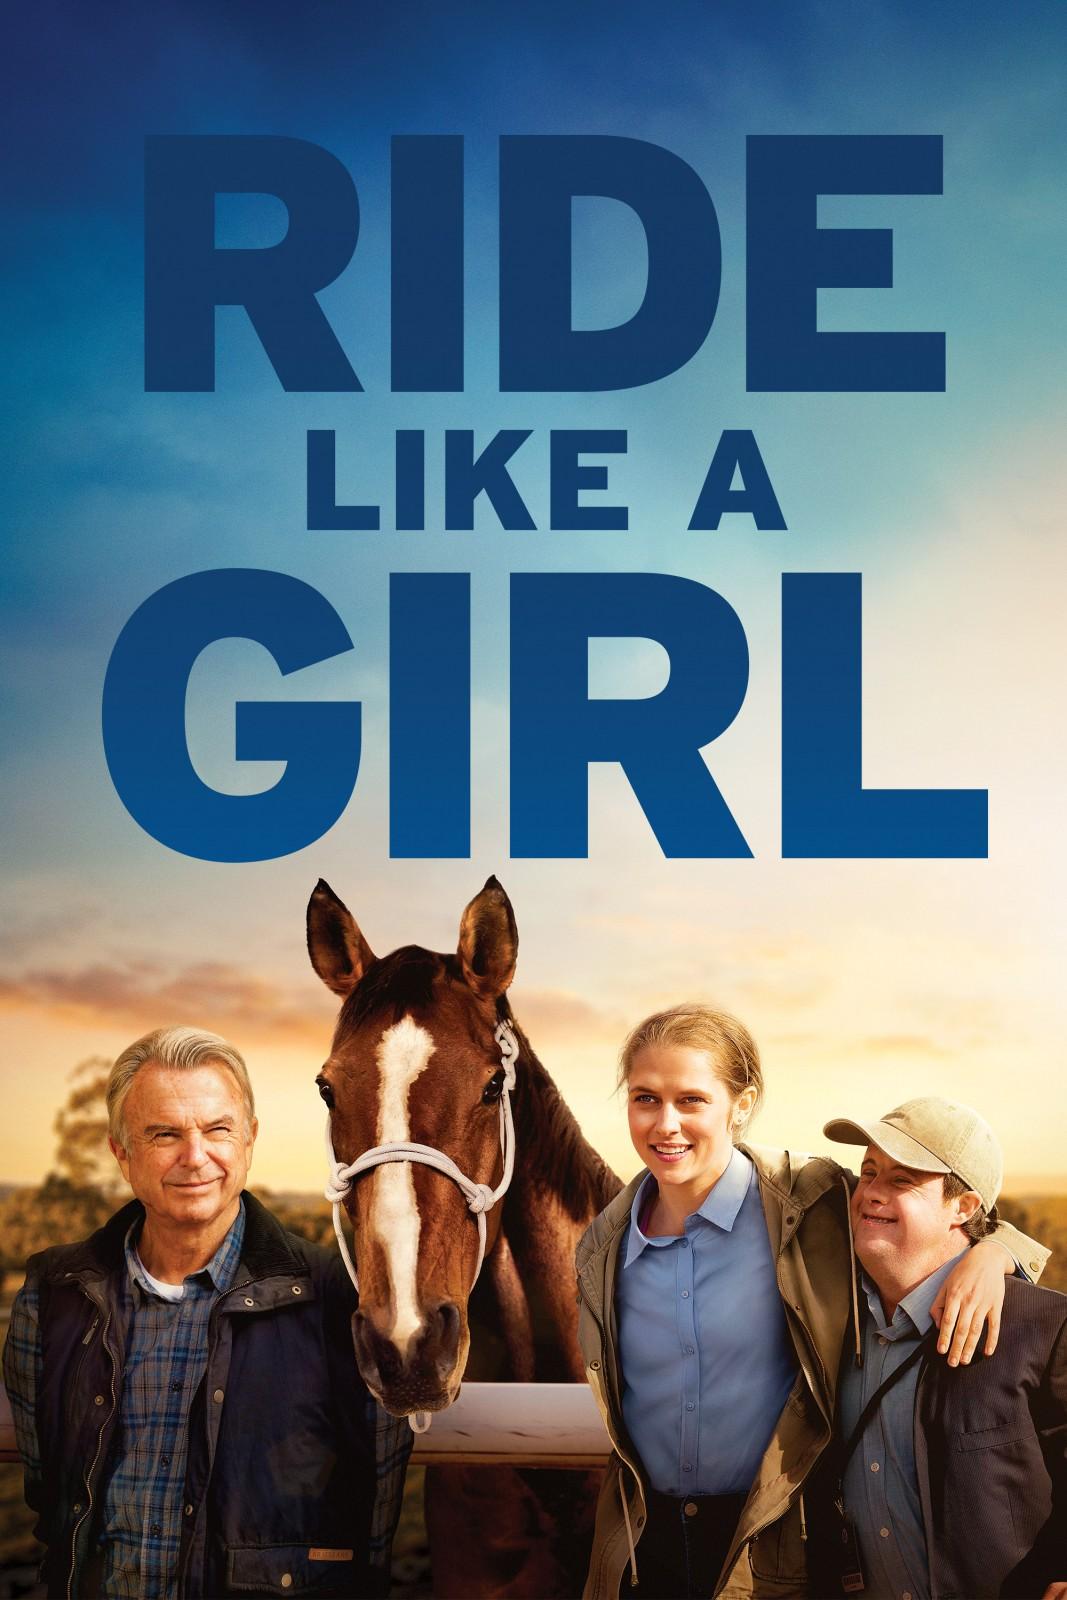 splendid film   Ride Like a Girl   Ihr größter Traum